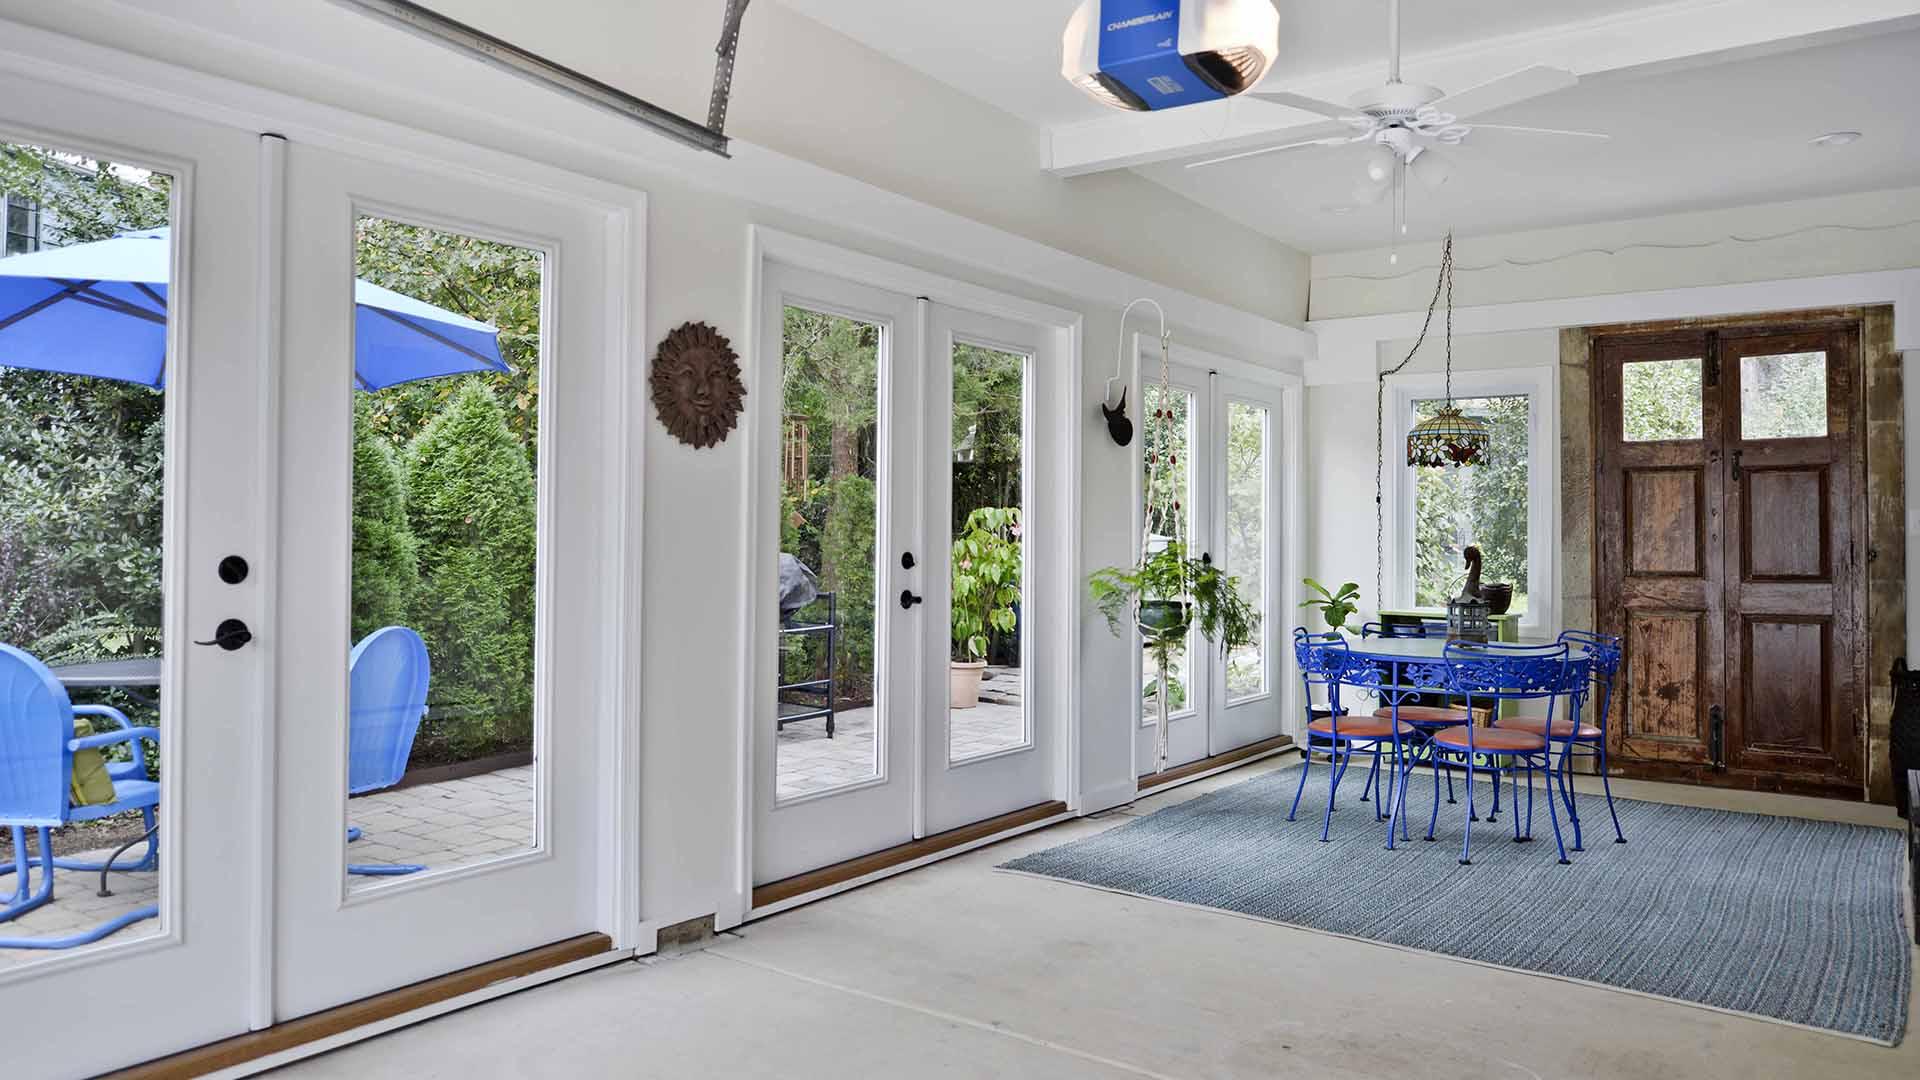 2020 NARI Capital CotY Grand Award Winner, Residential Addition Under $100,000